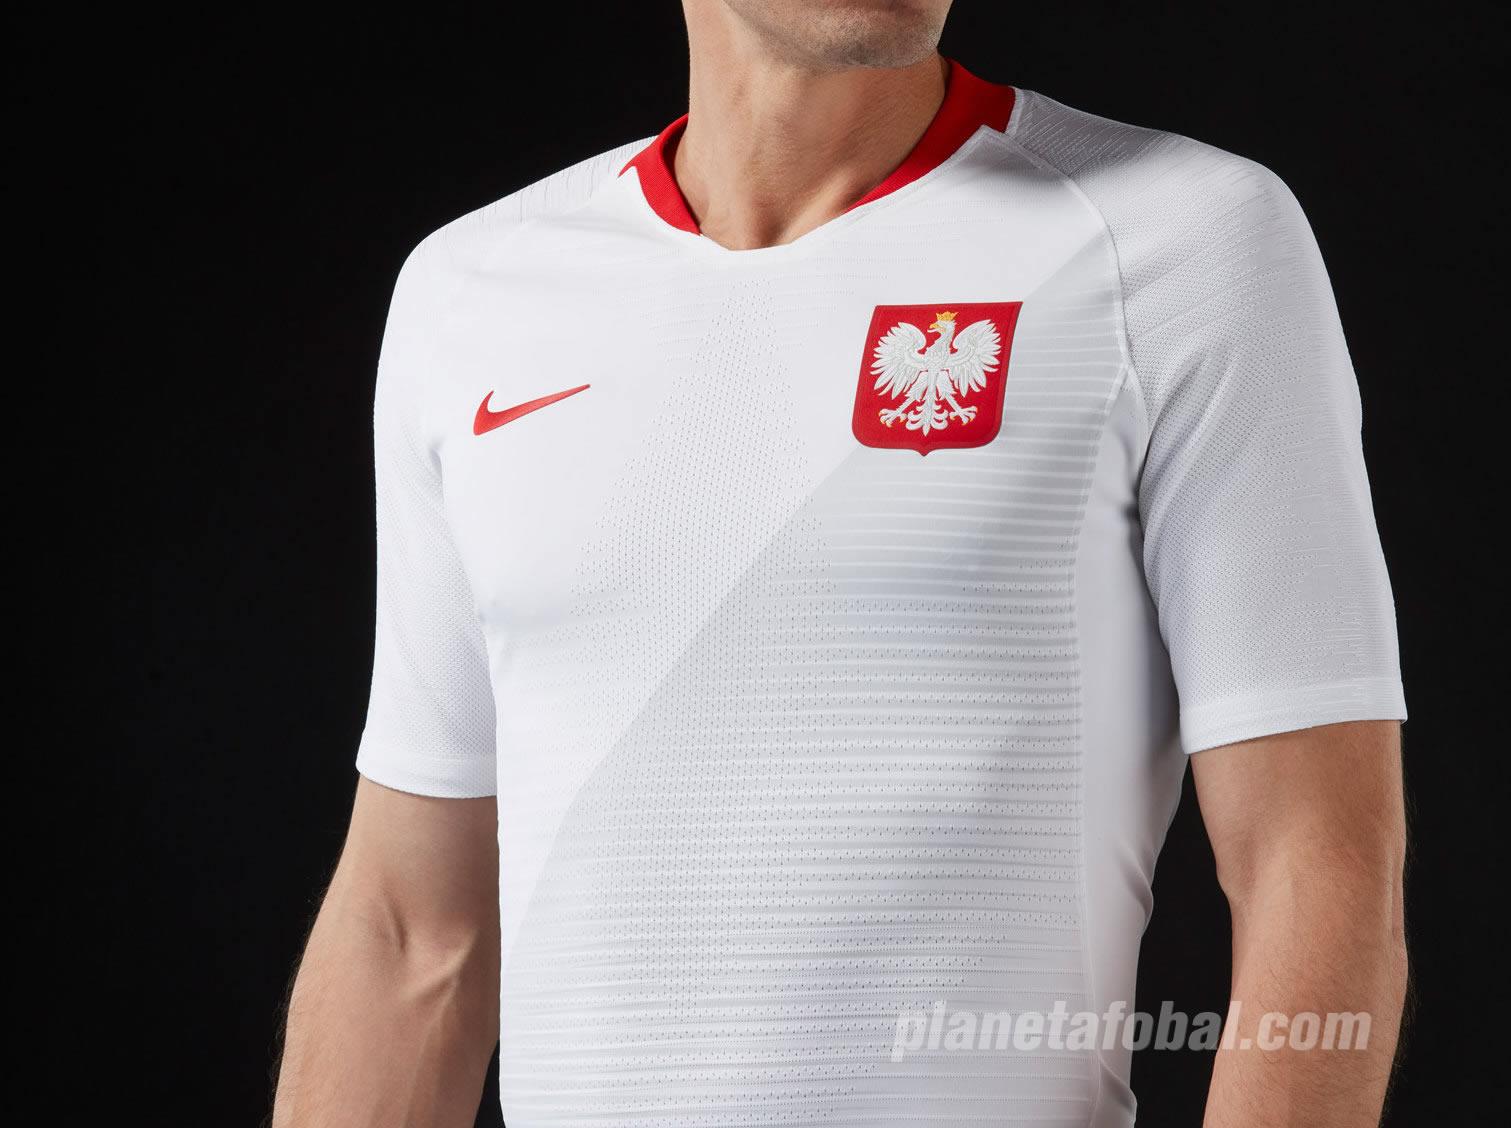 2018 Mundial Nike Polonia Camisetas De Nnw0mvO8